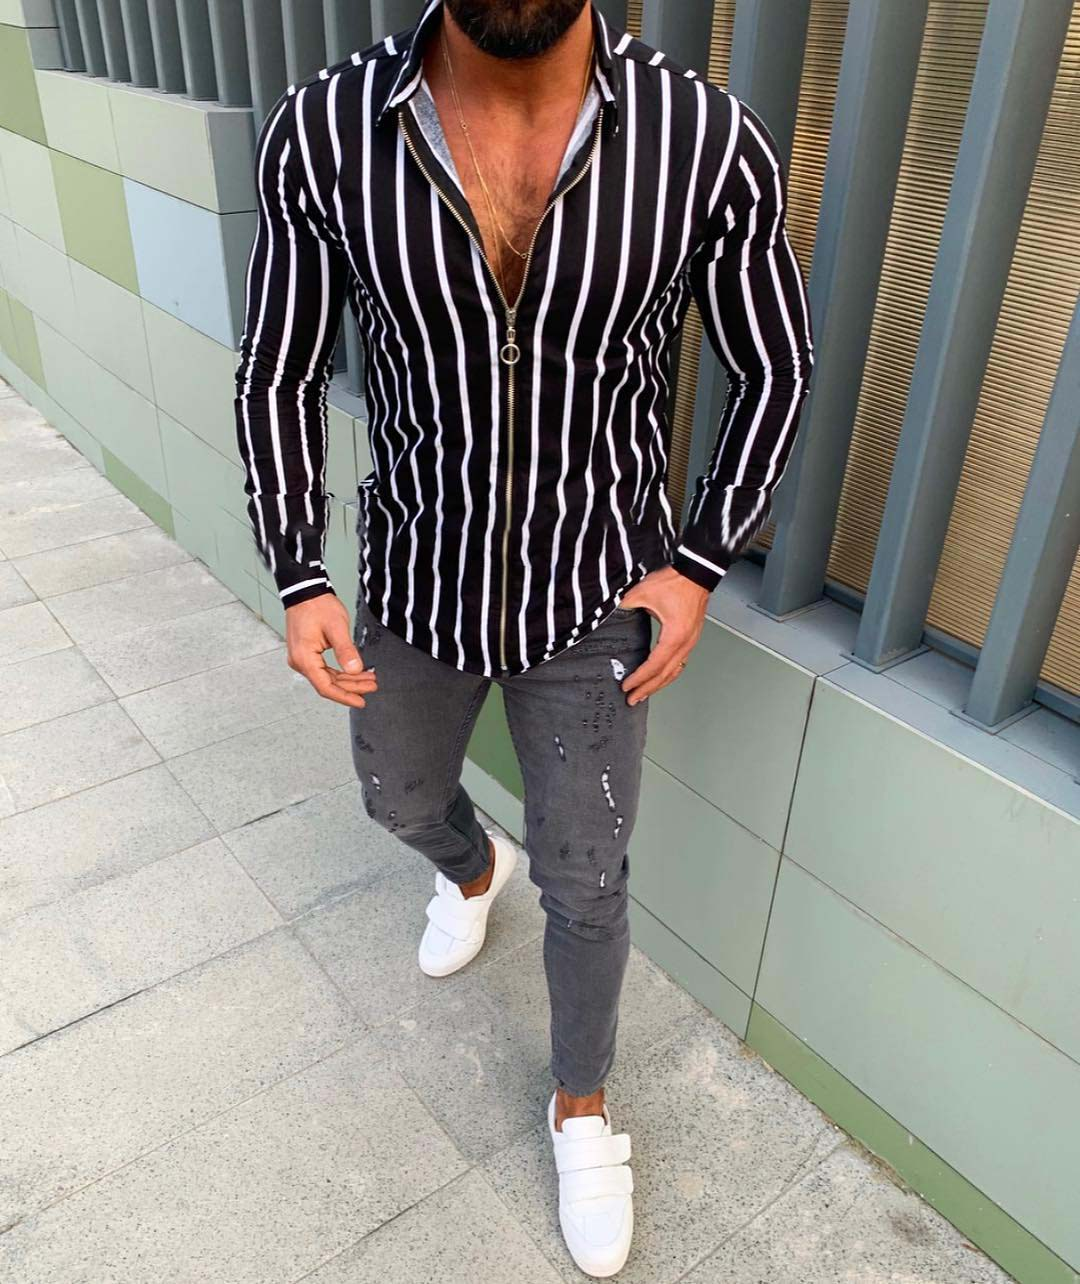 2019 Men Fashion Shirts Autumn Casual Long Sleeve Sweatshirts Zipper Up Striped Shand Collar Business Shirts Open Front Zip Tops in Casual Shirts from Men 39 s Clothing